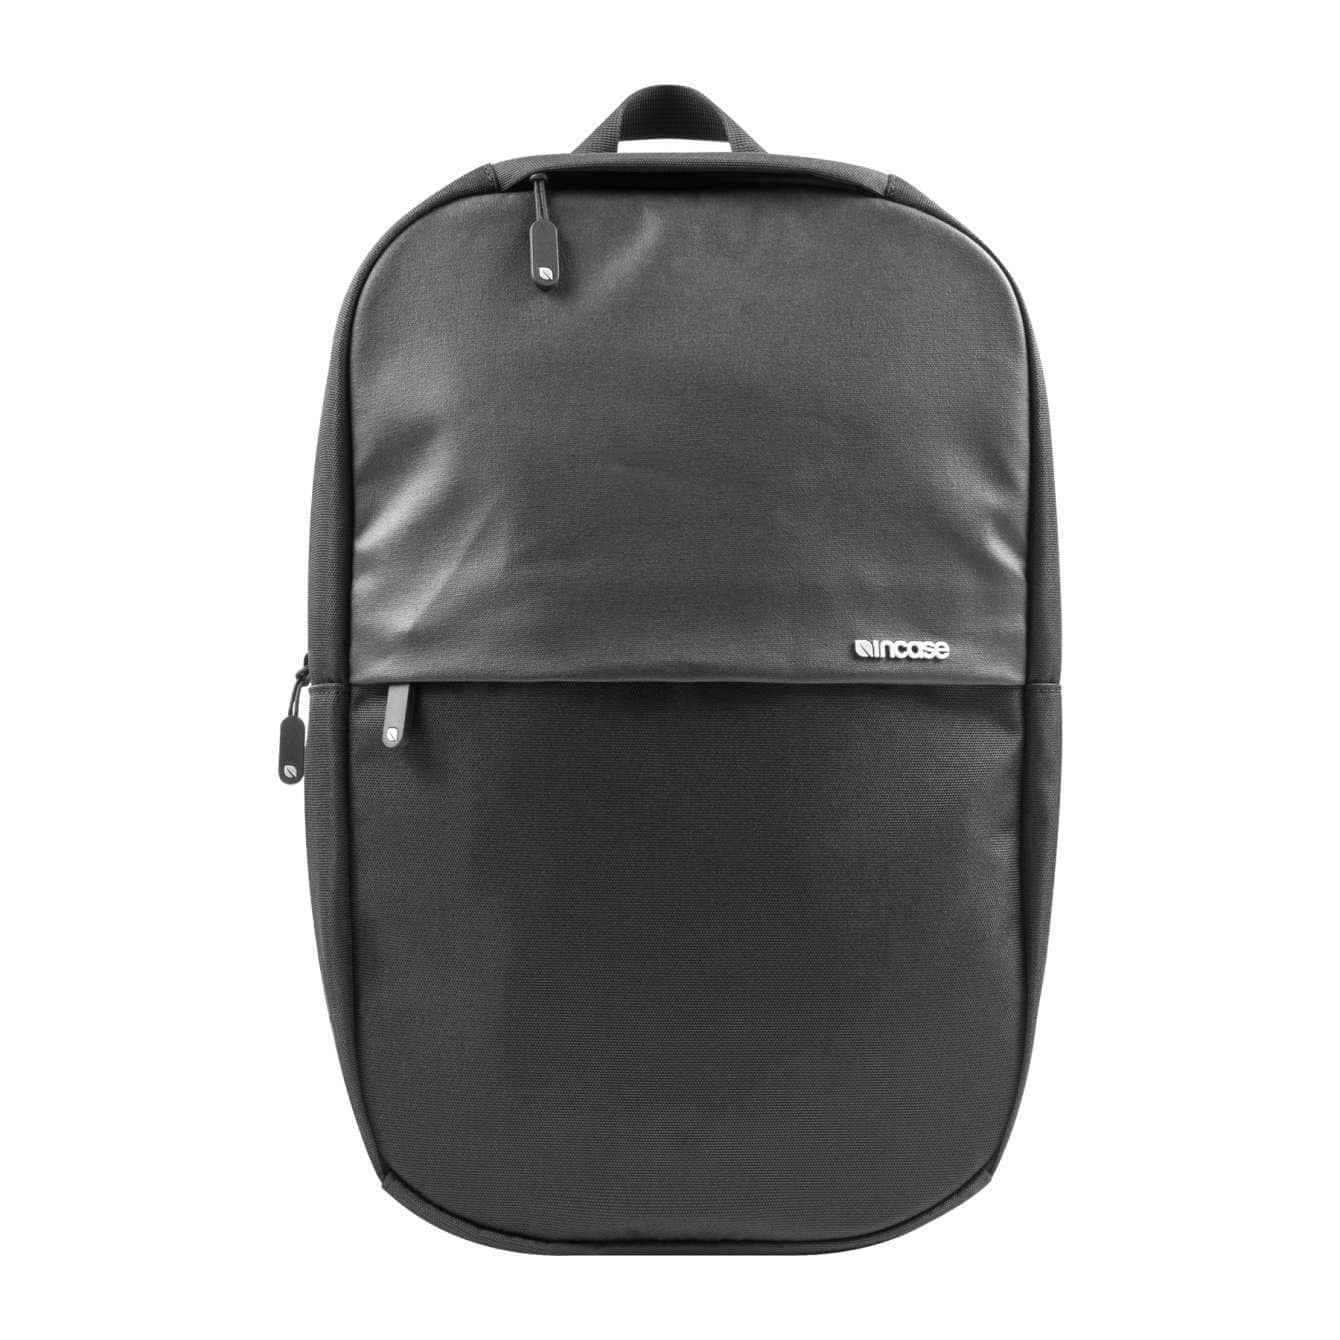 Incase Campus Exclusive Mini Backpack - Black - CL60430